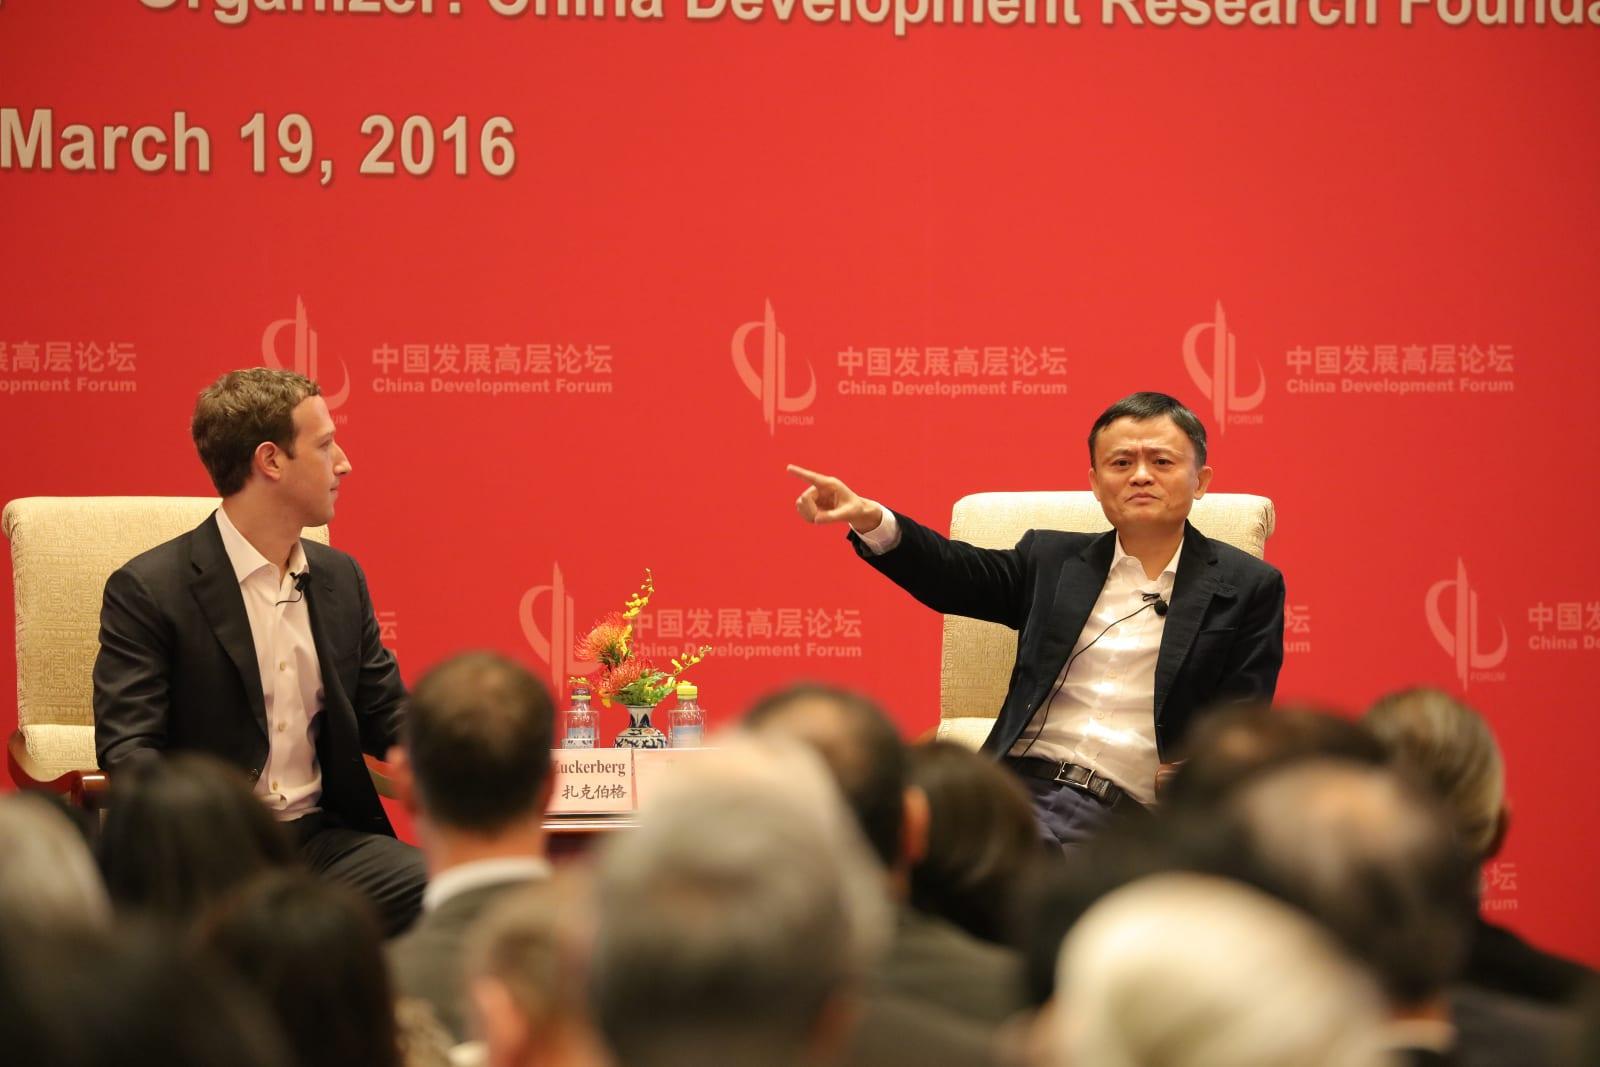 China Development Forum 2016 In Beijing